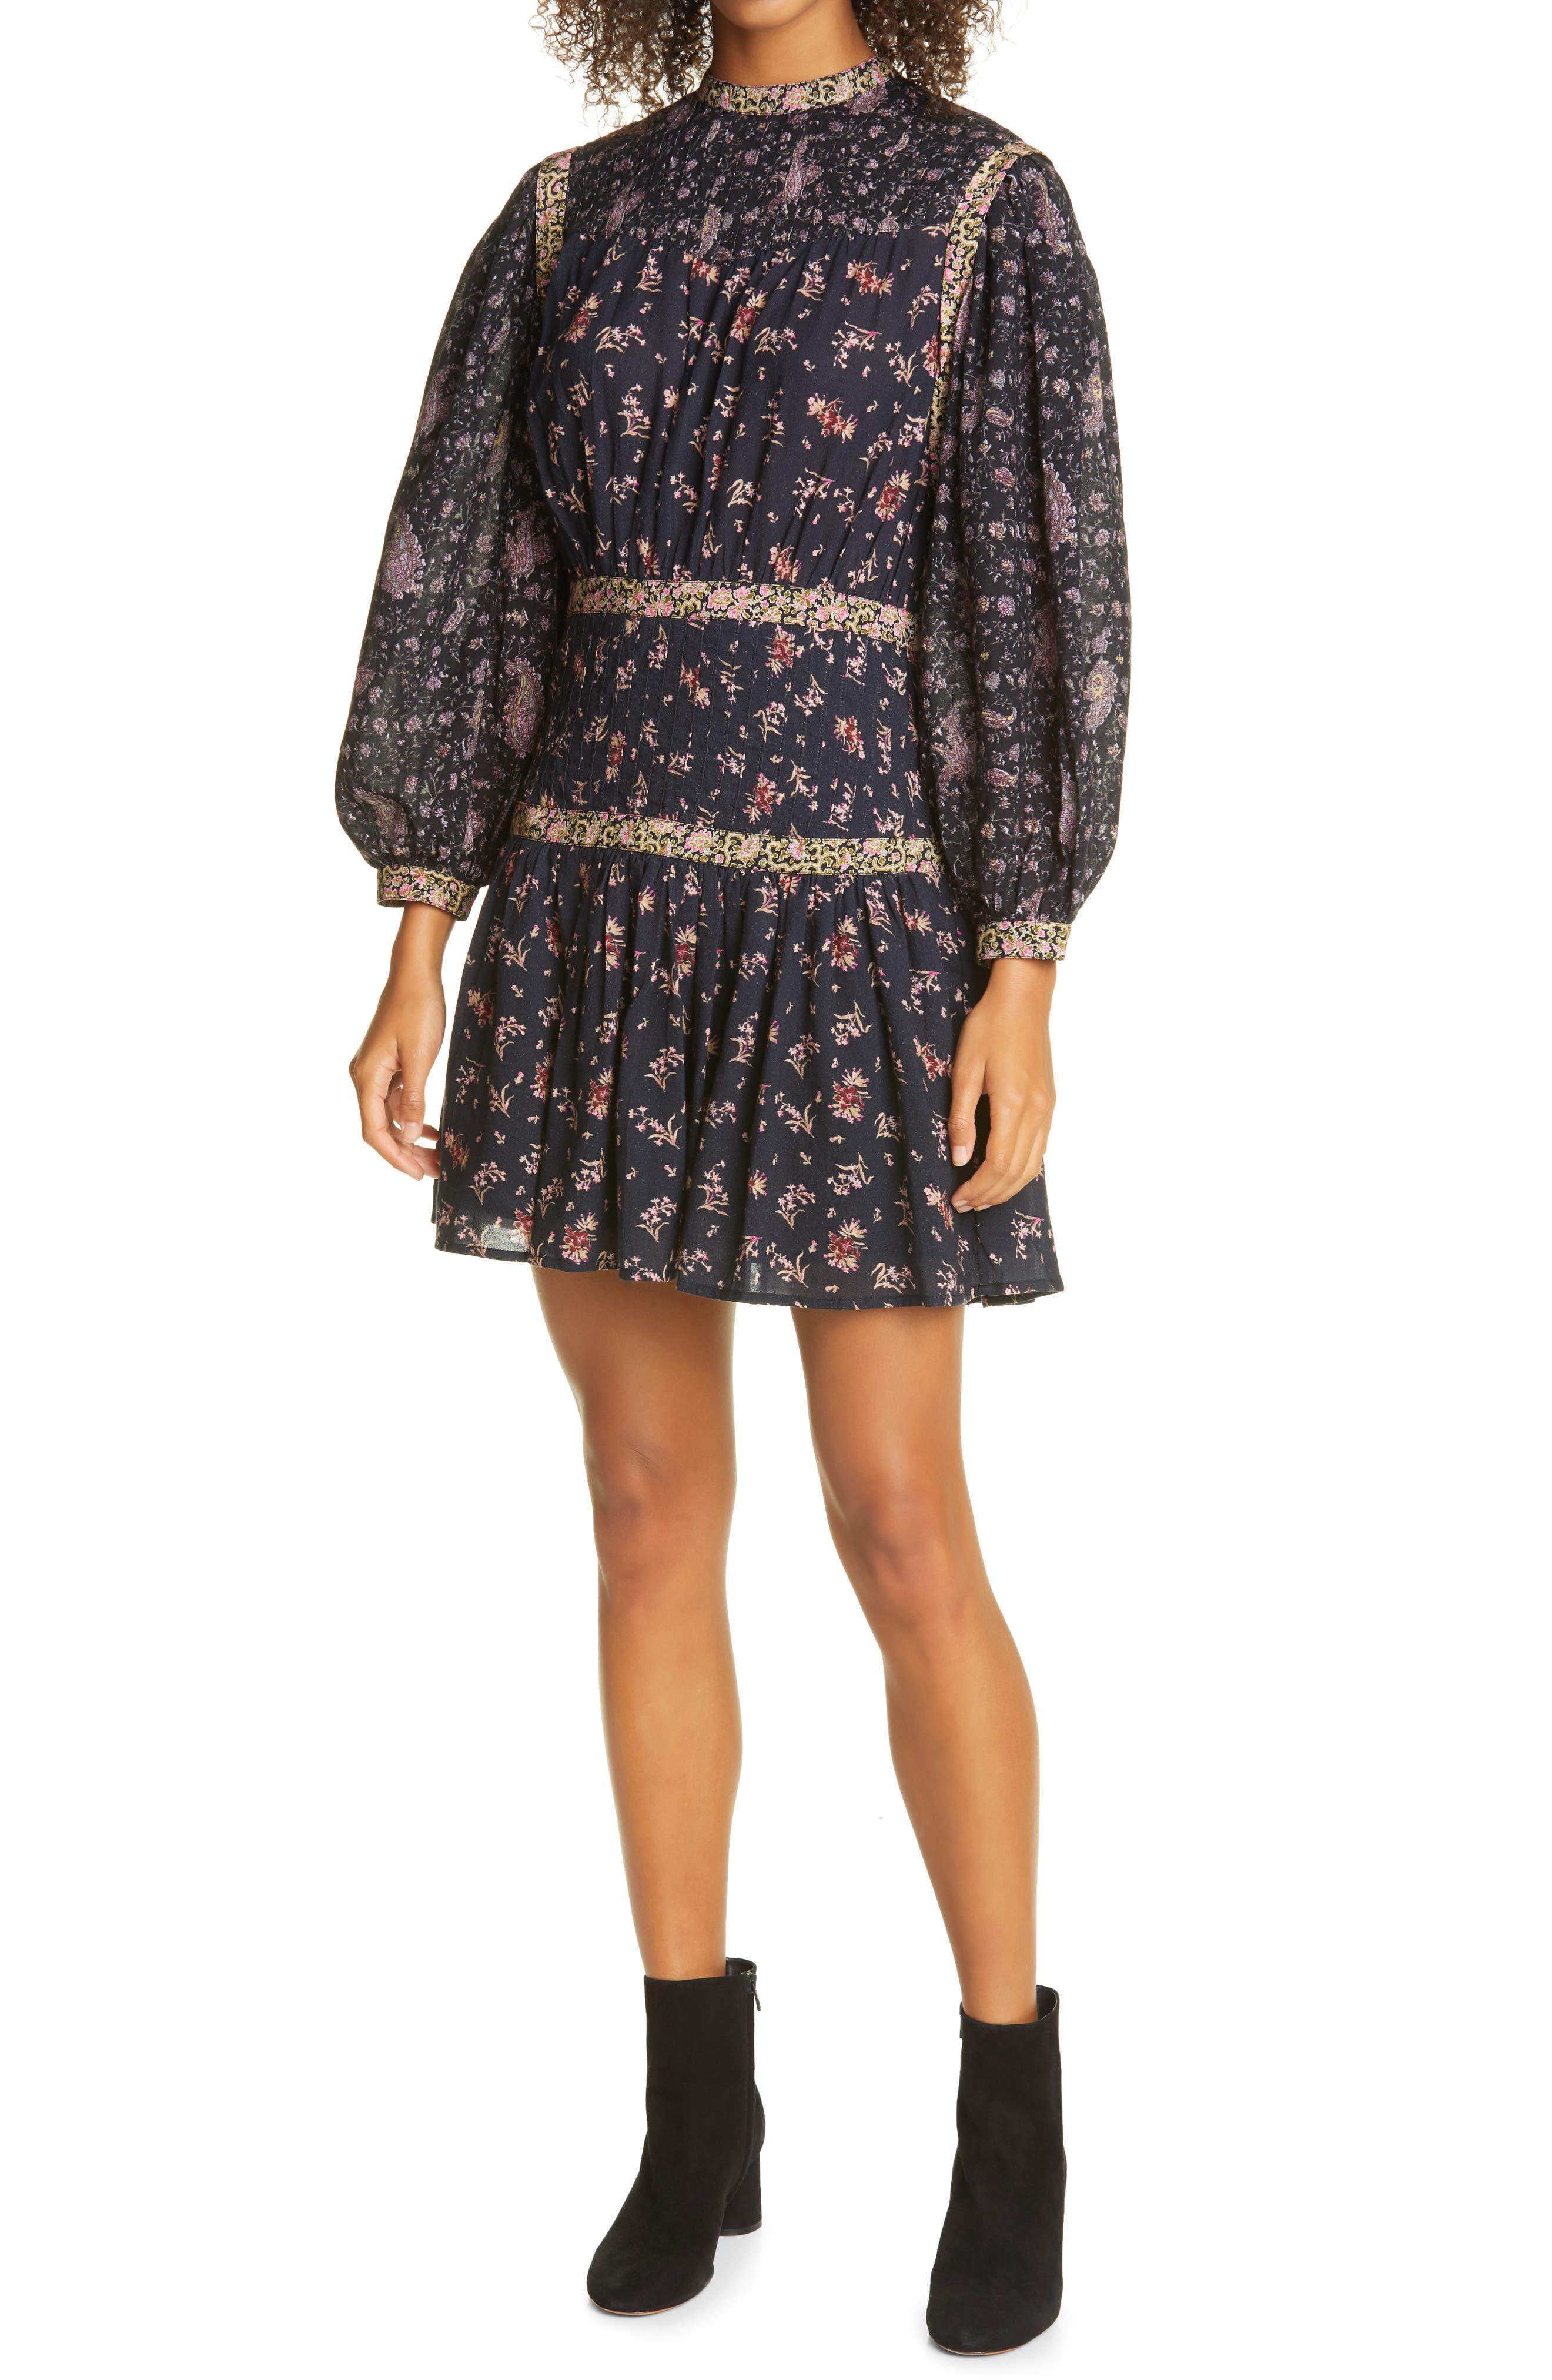 La Vie Rebecca Taylor Mixed Floral Print Long Sleeve Dress | Nordstrom